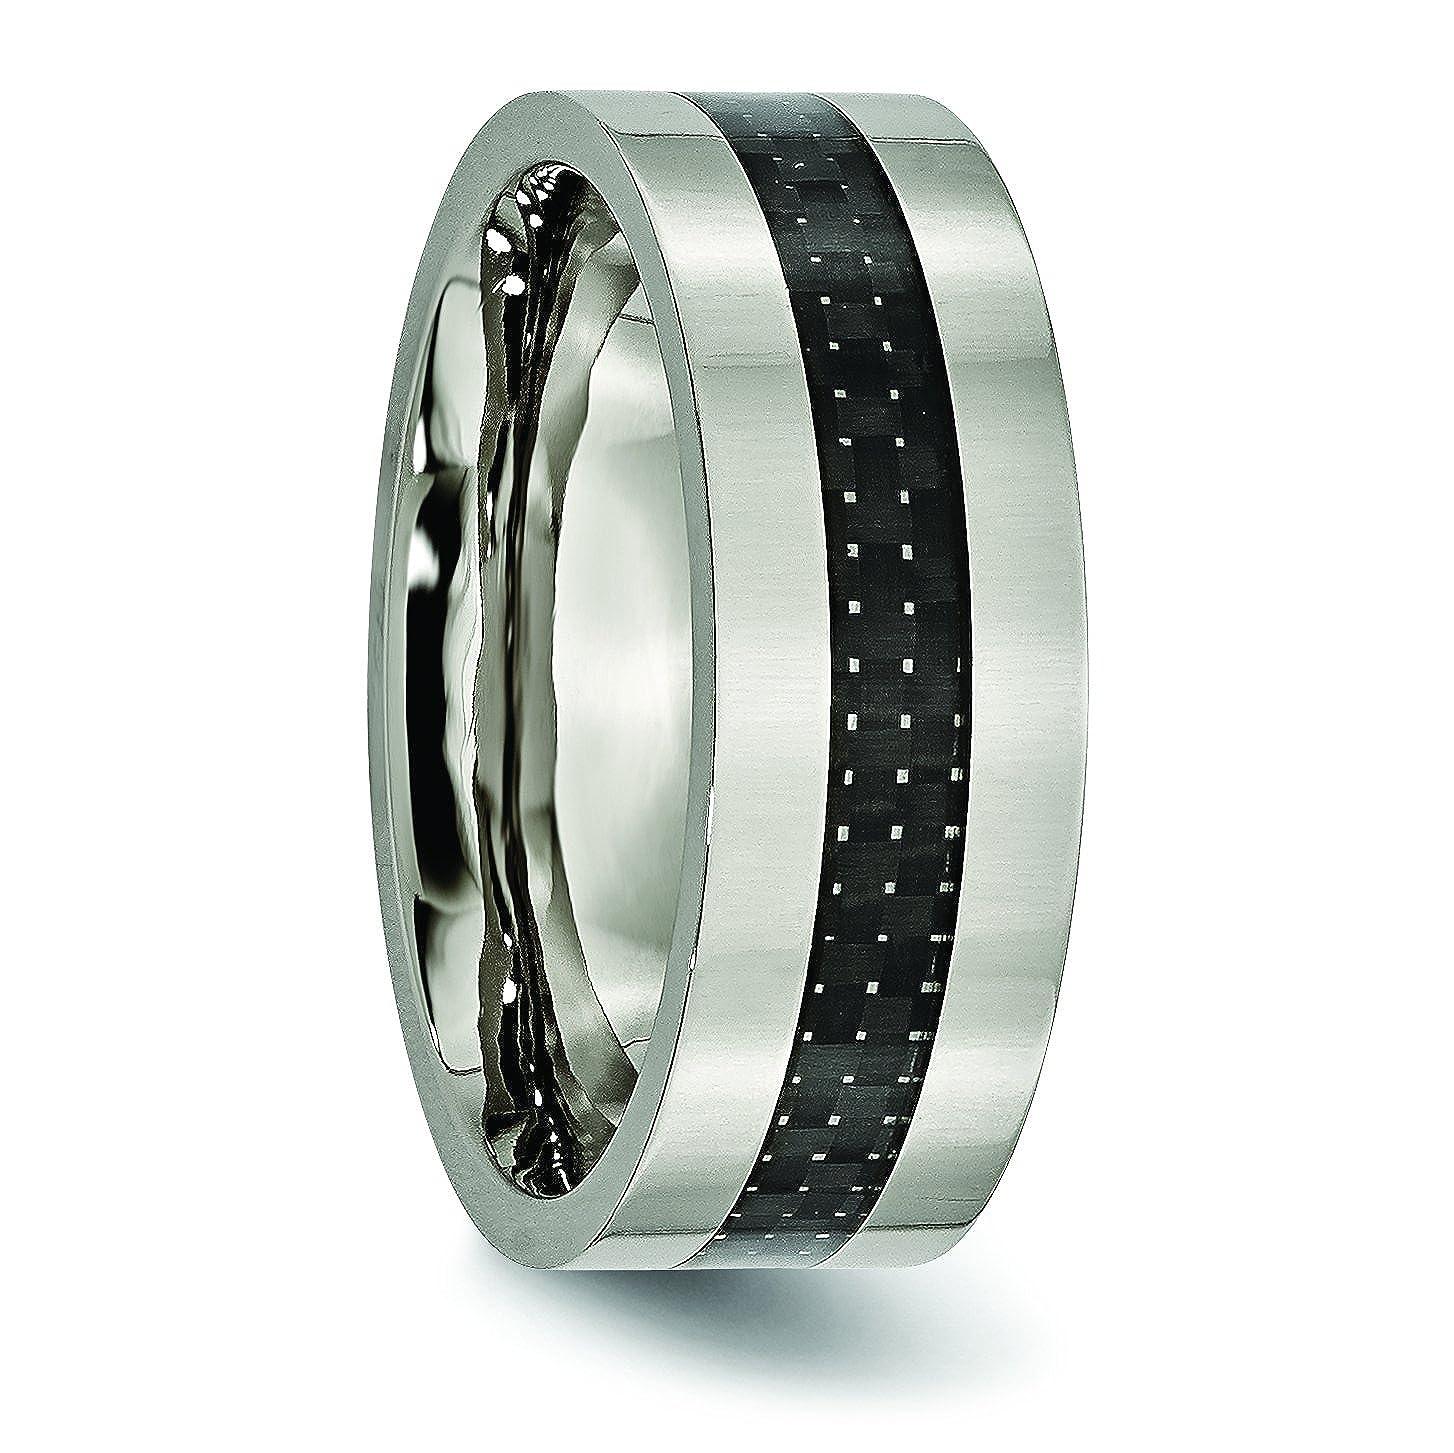 Jewelry Pot Titanium Carbon Fiber Flat 8mm Polished Engravable Band